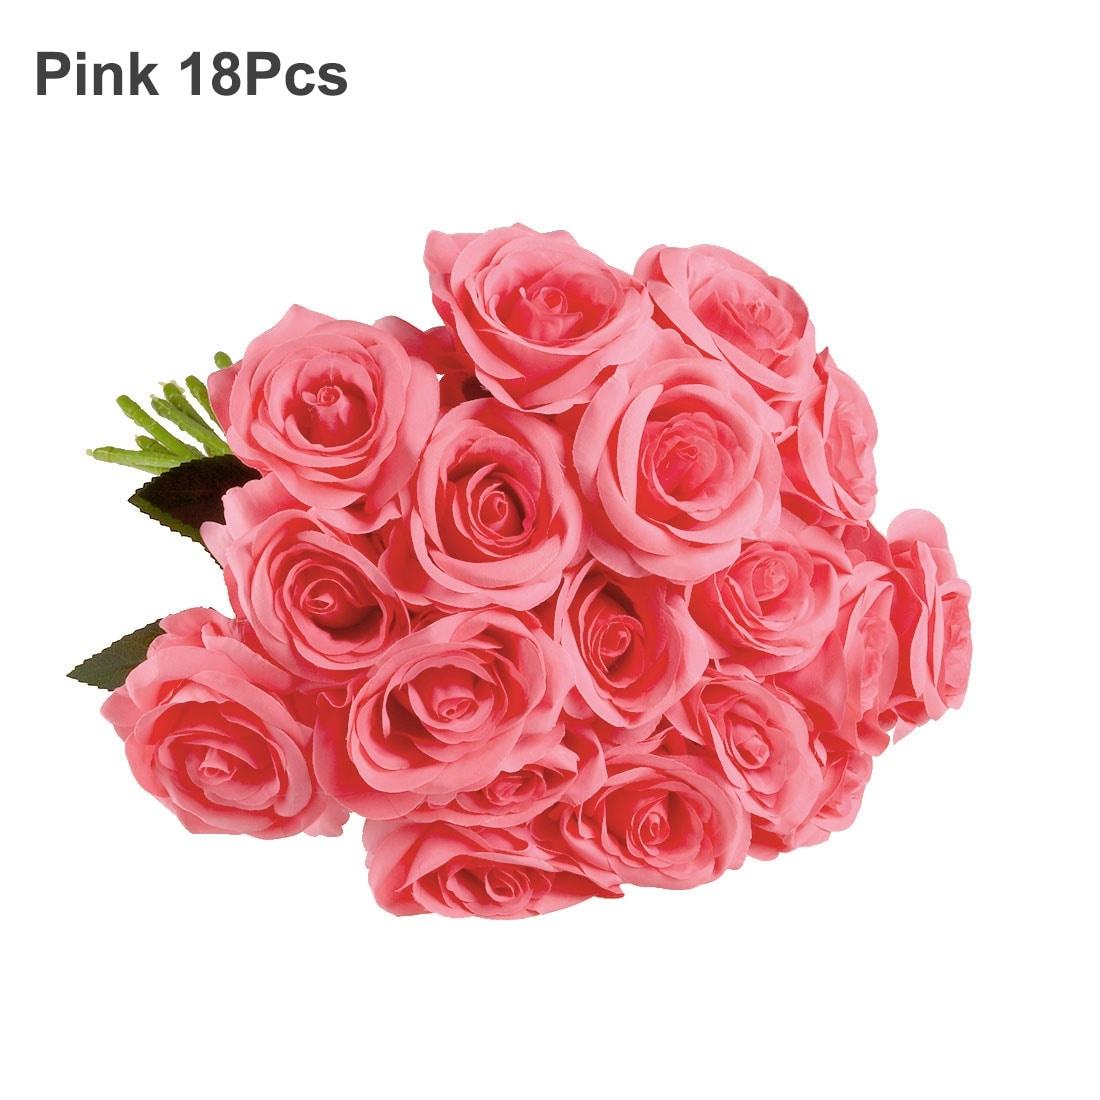 Shop Artificial Silk Rose Flower Bouquet Wedding Party Home Decor